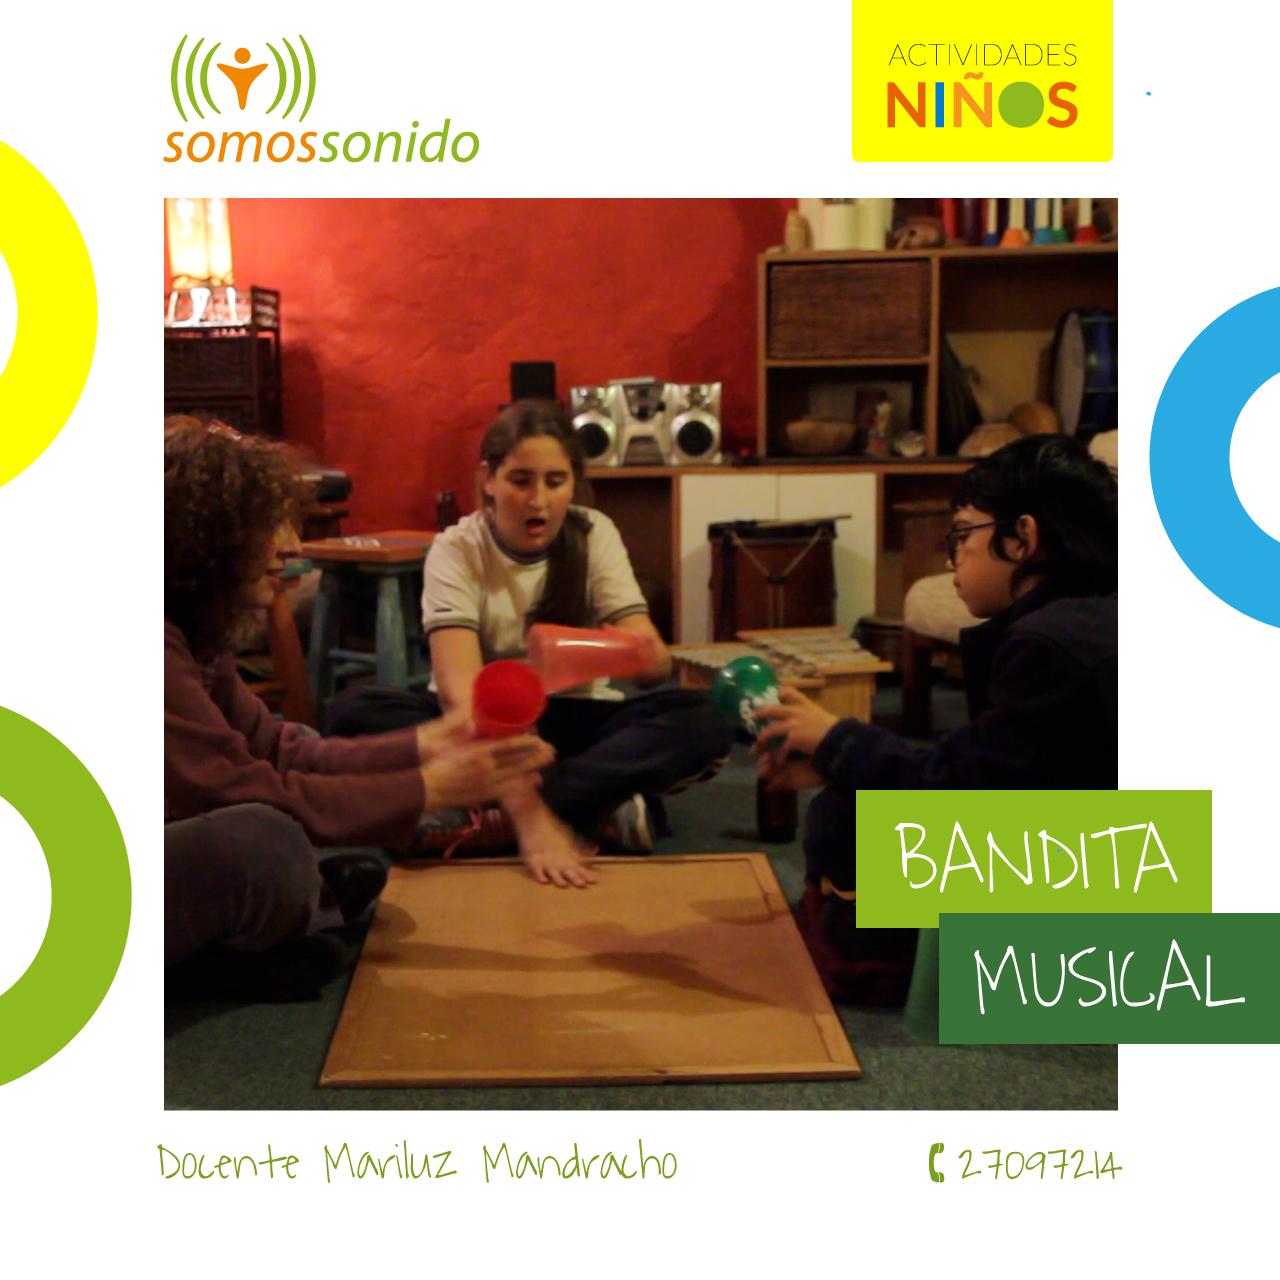 somos_sonido_fb_bandita_musical